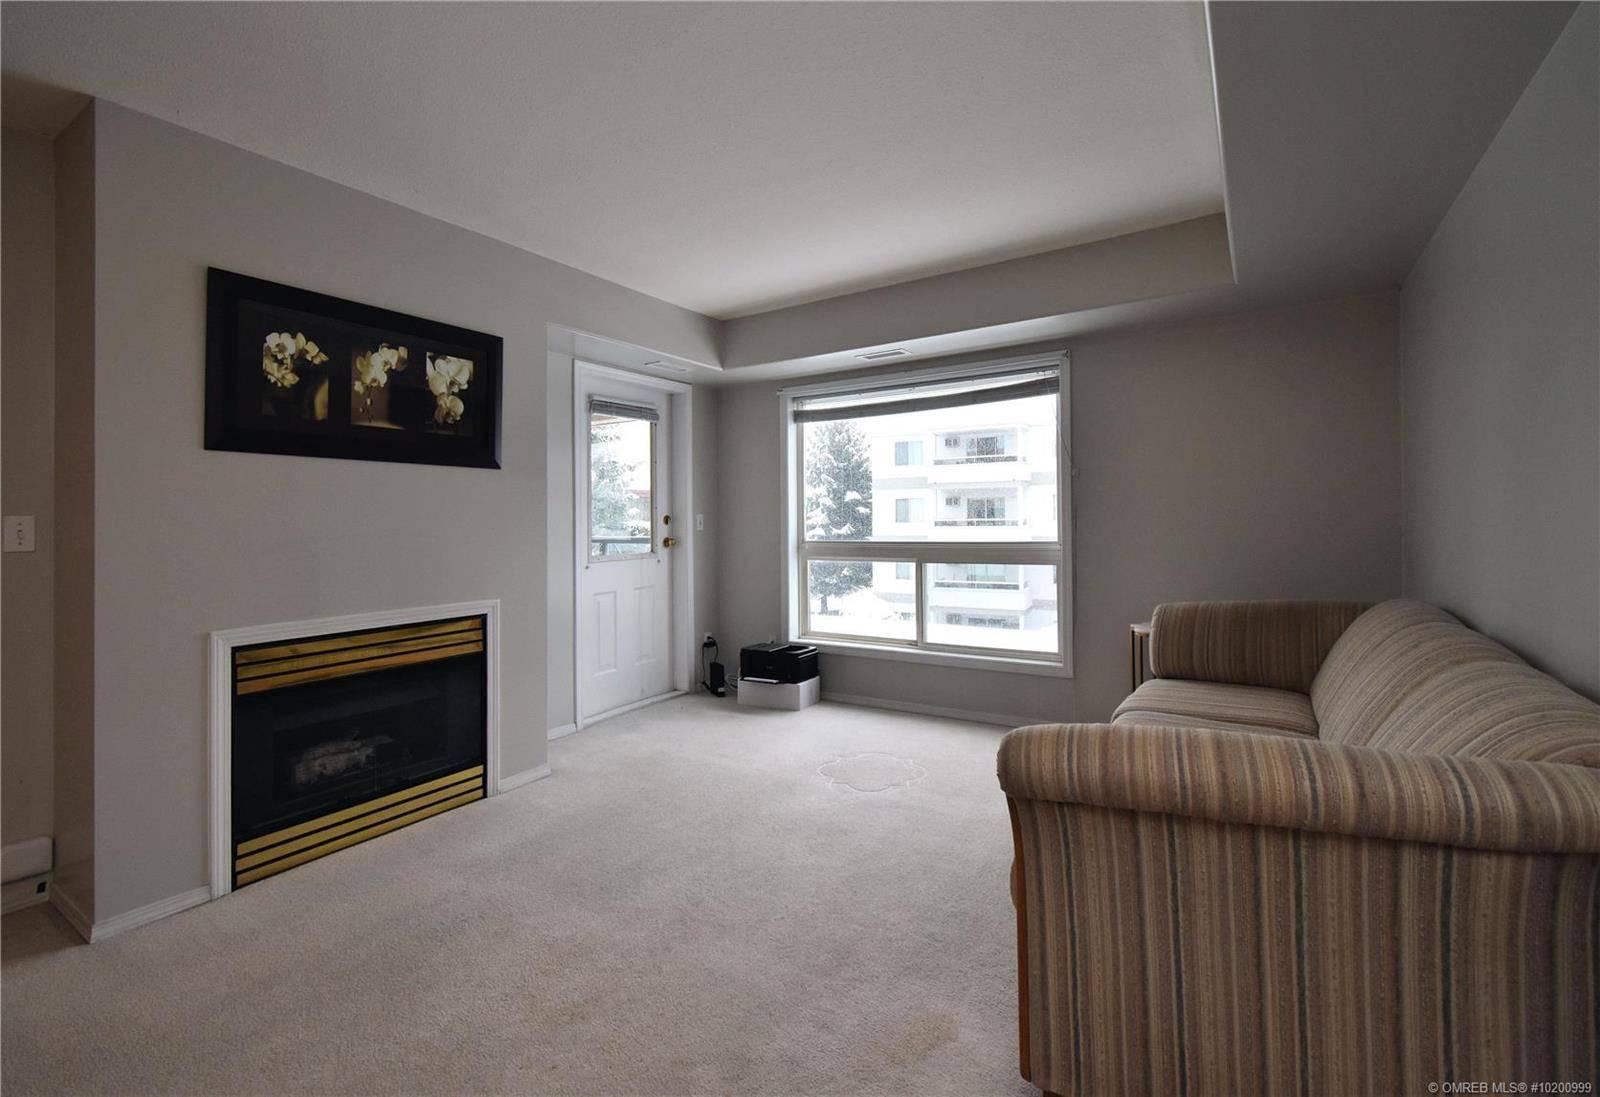 Condo for sale at 3115 De Montreuil Ct Unit 308 Kelowna British Columbia - MLS: 10200999